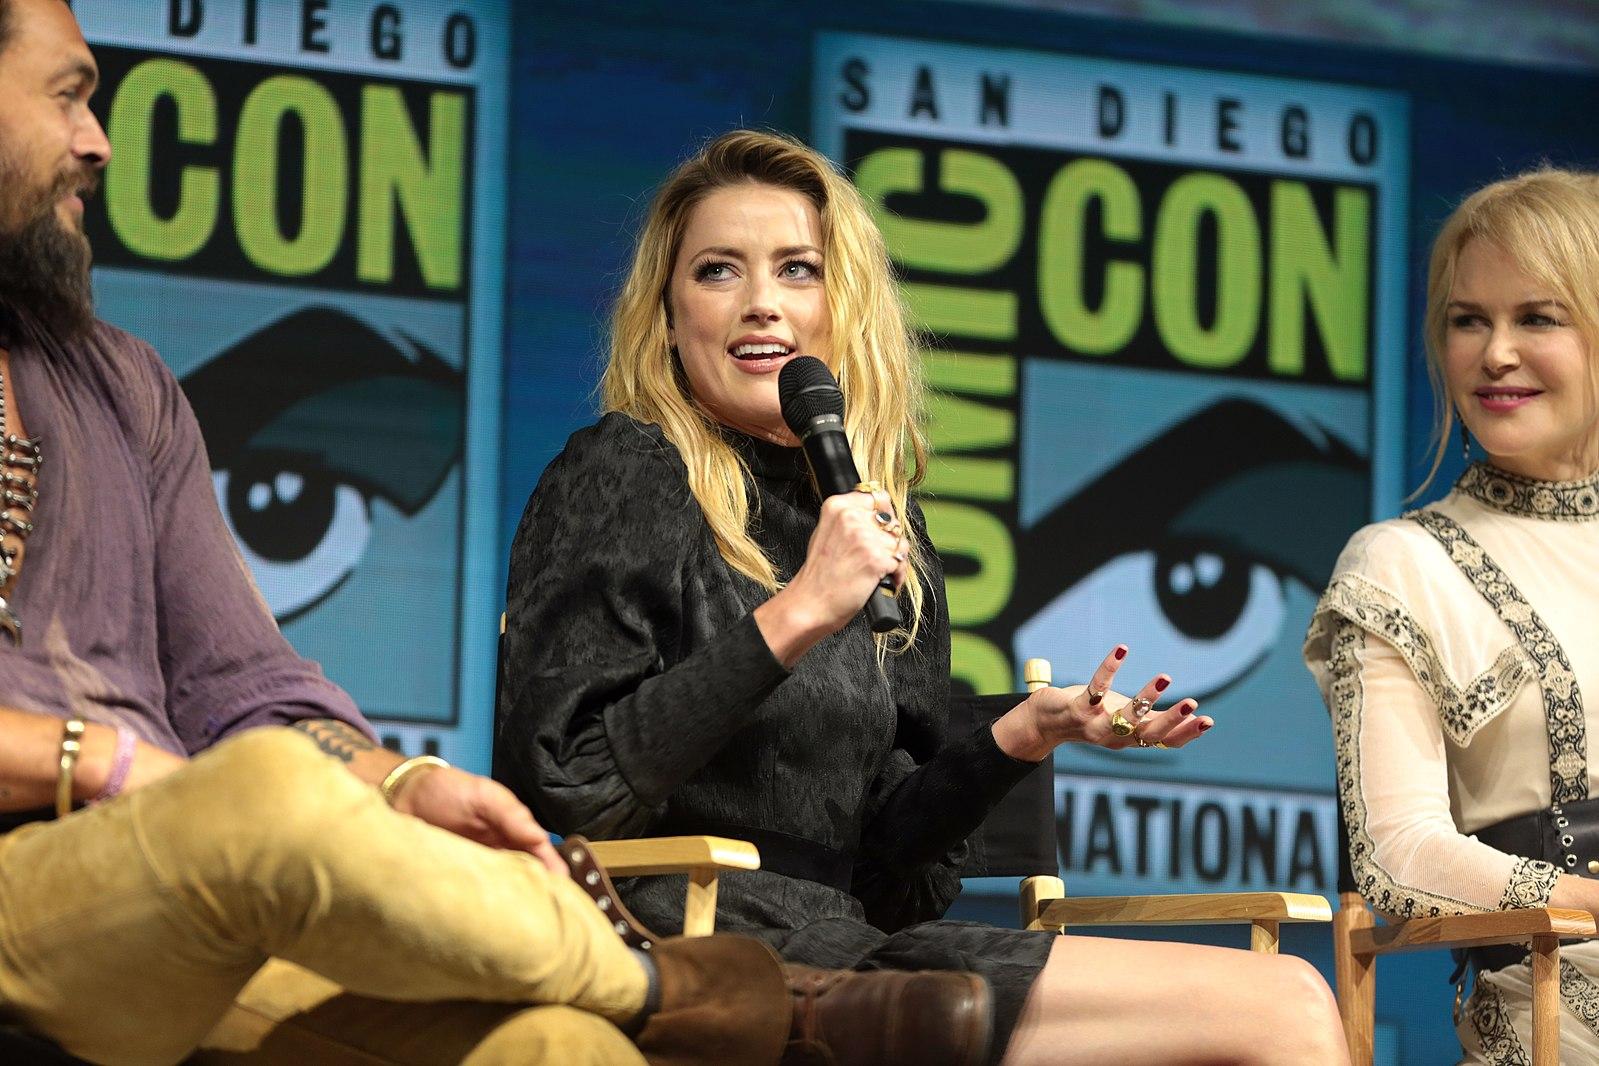 Amber Heard Domestic Violence: Fans Seek Justice For Johnny Depp